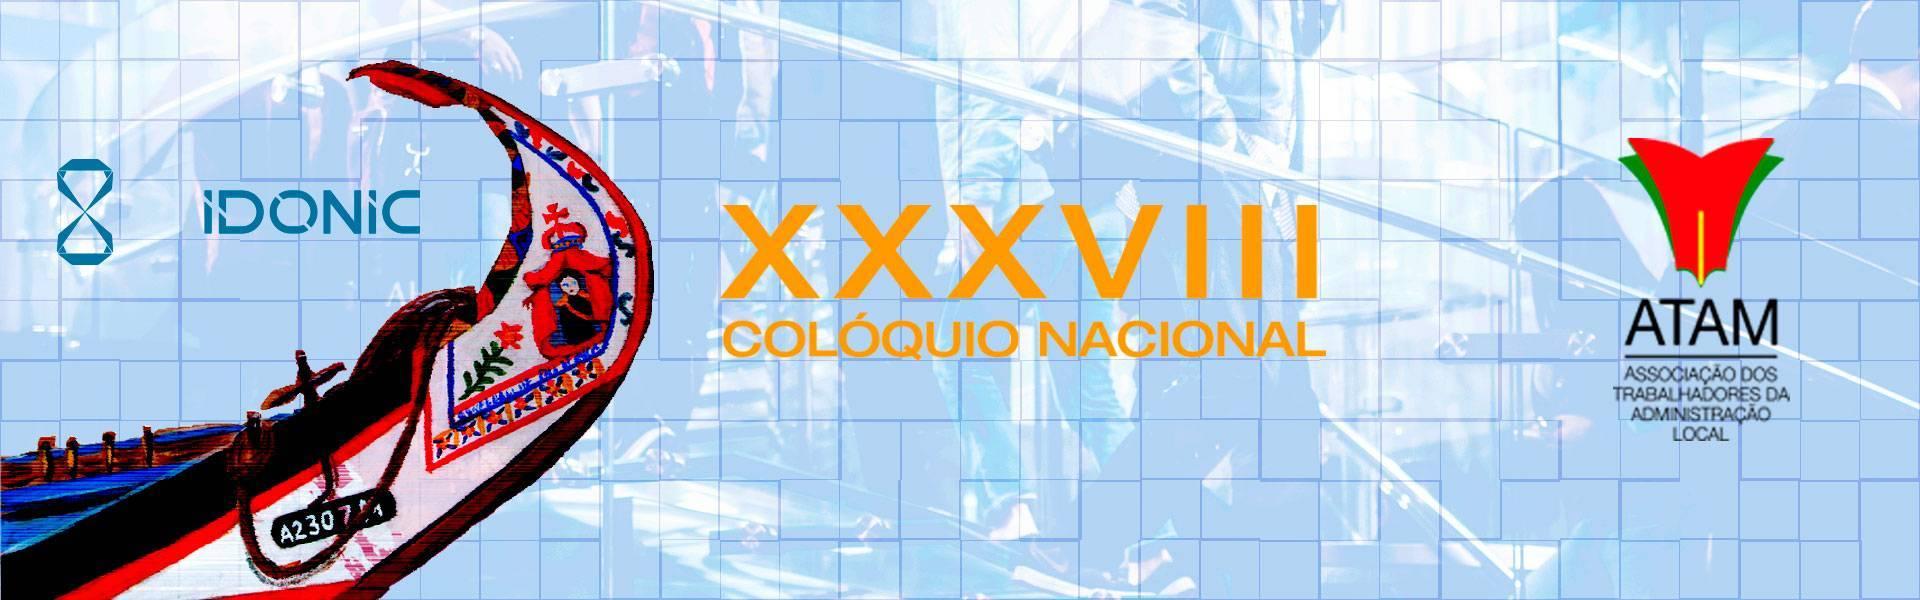 xxxviii-coloquio-nacional-atam-idonic